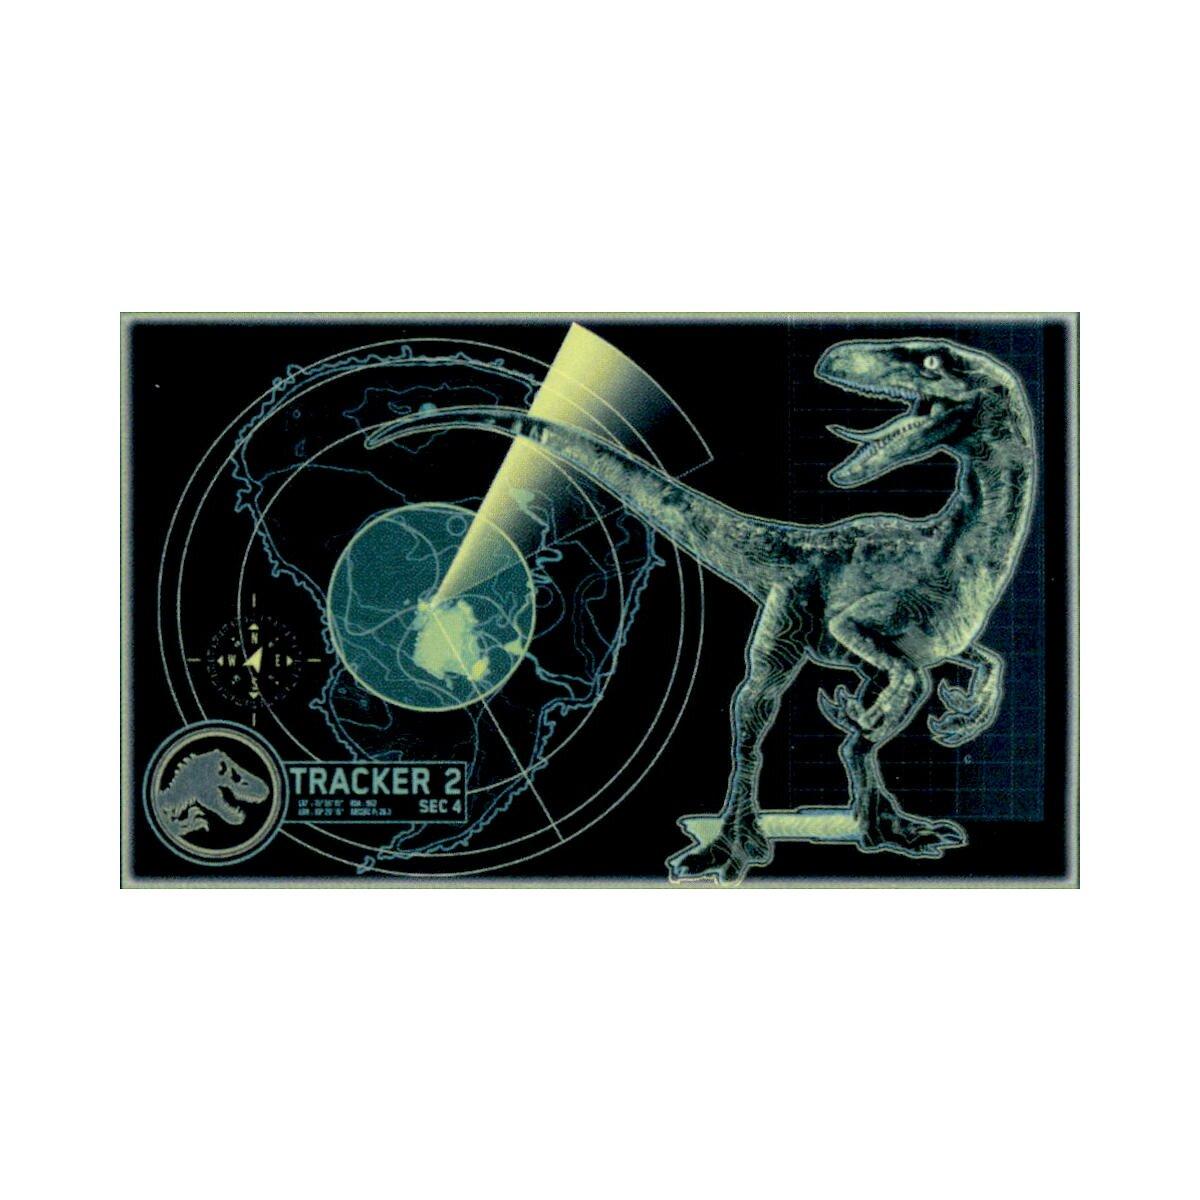 Panini-Jurassic World serie 2-sticker 1